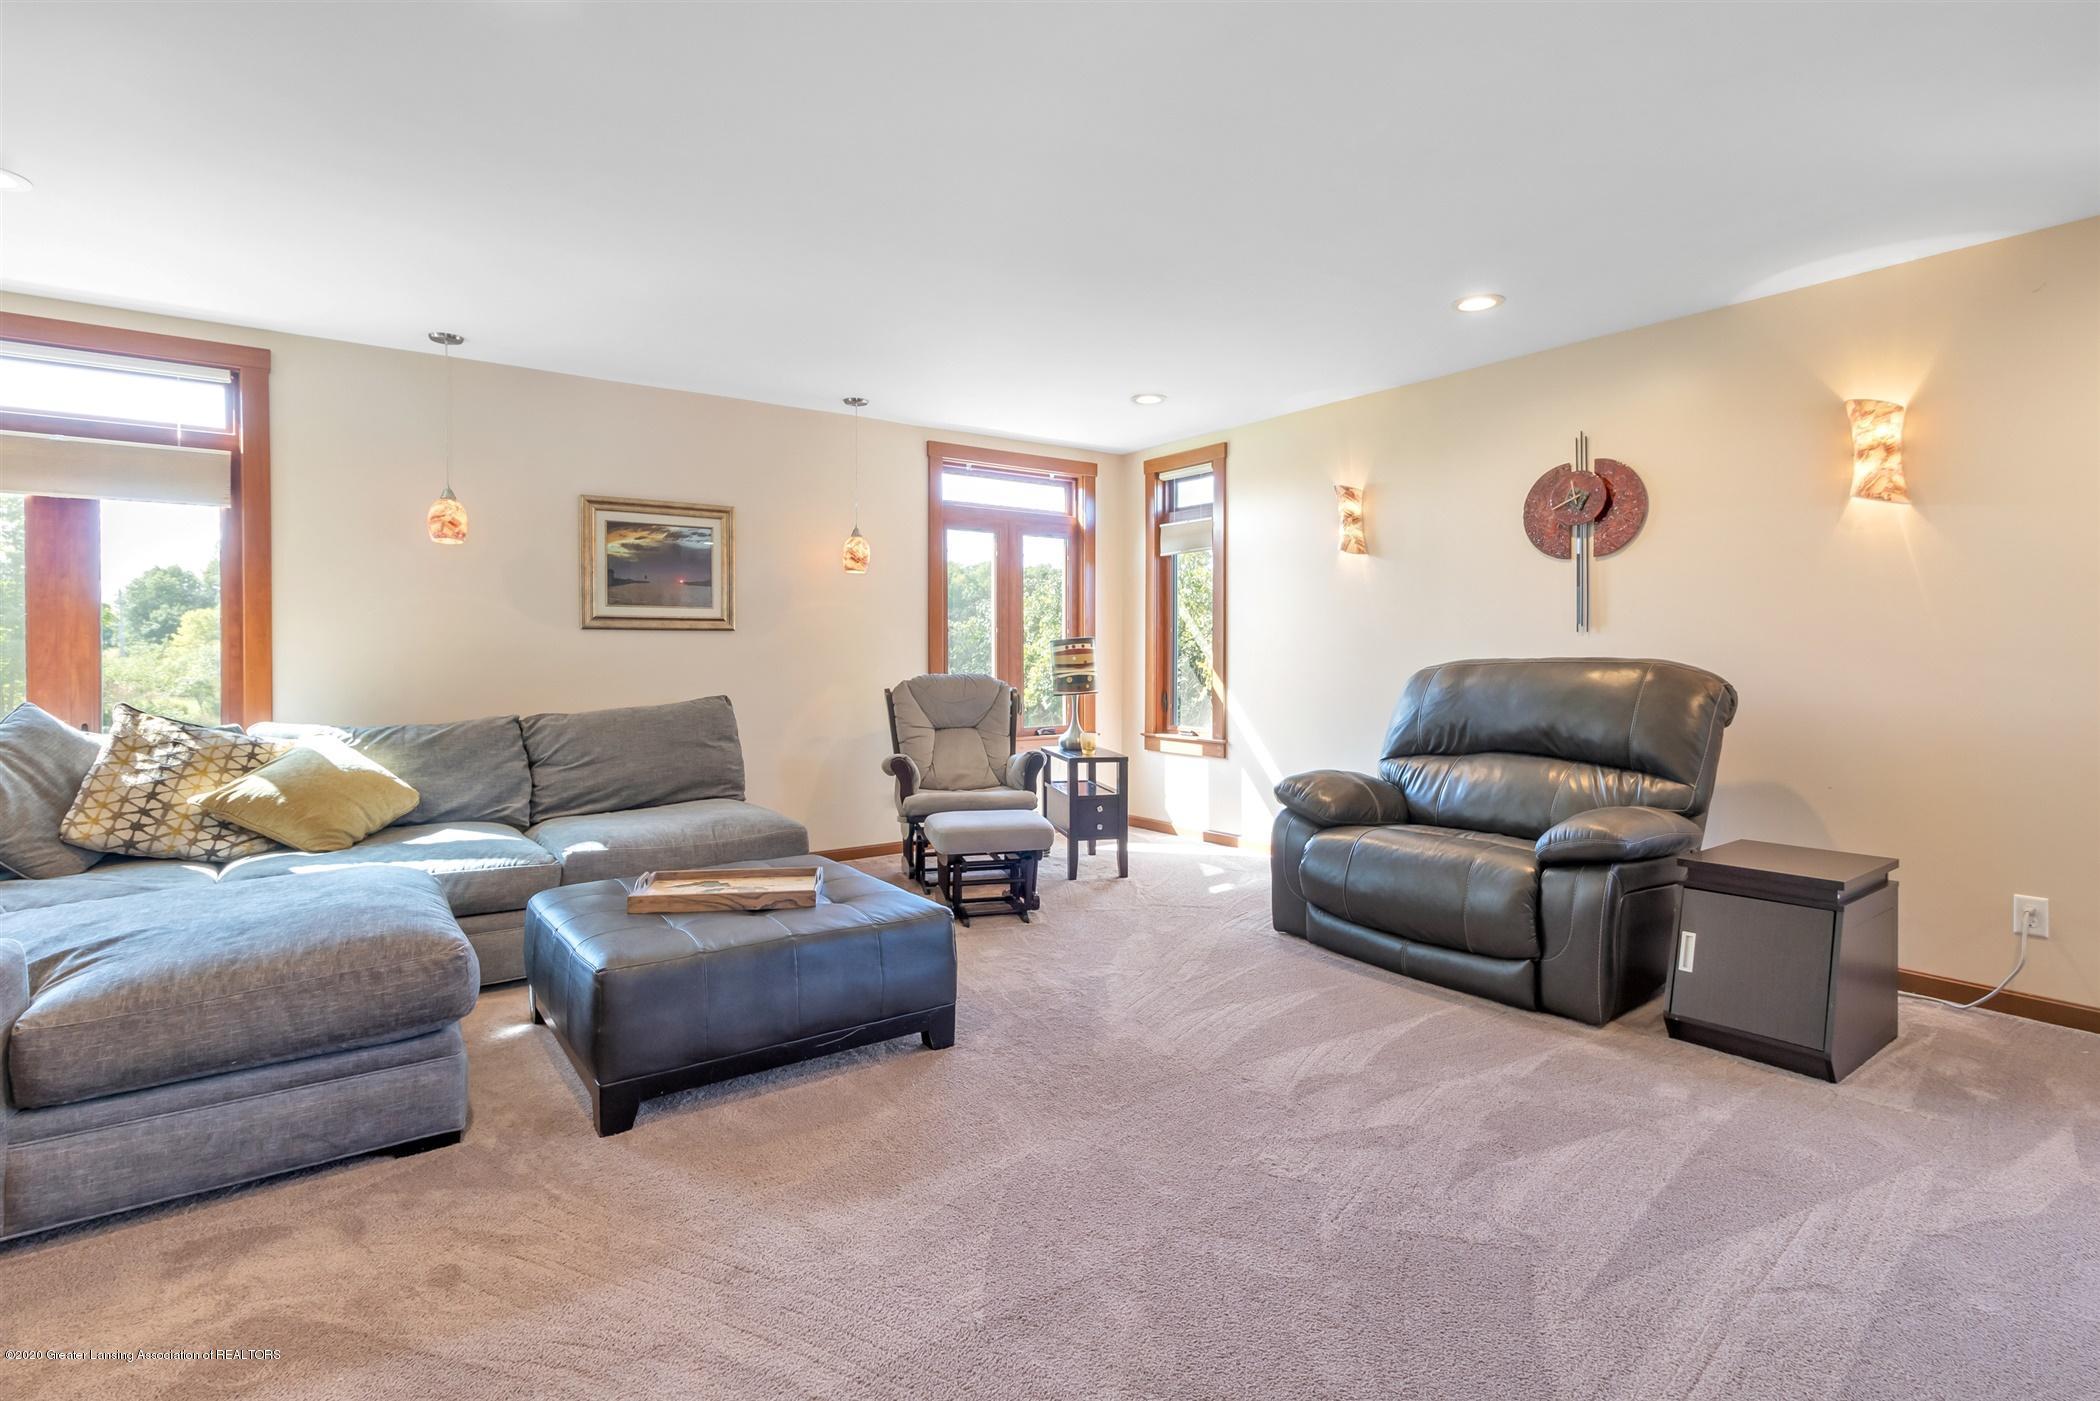 7346 W Cutler Rd - LIVING ROOM BEAUTIFUL VIEWS OF SUNSET - 30